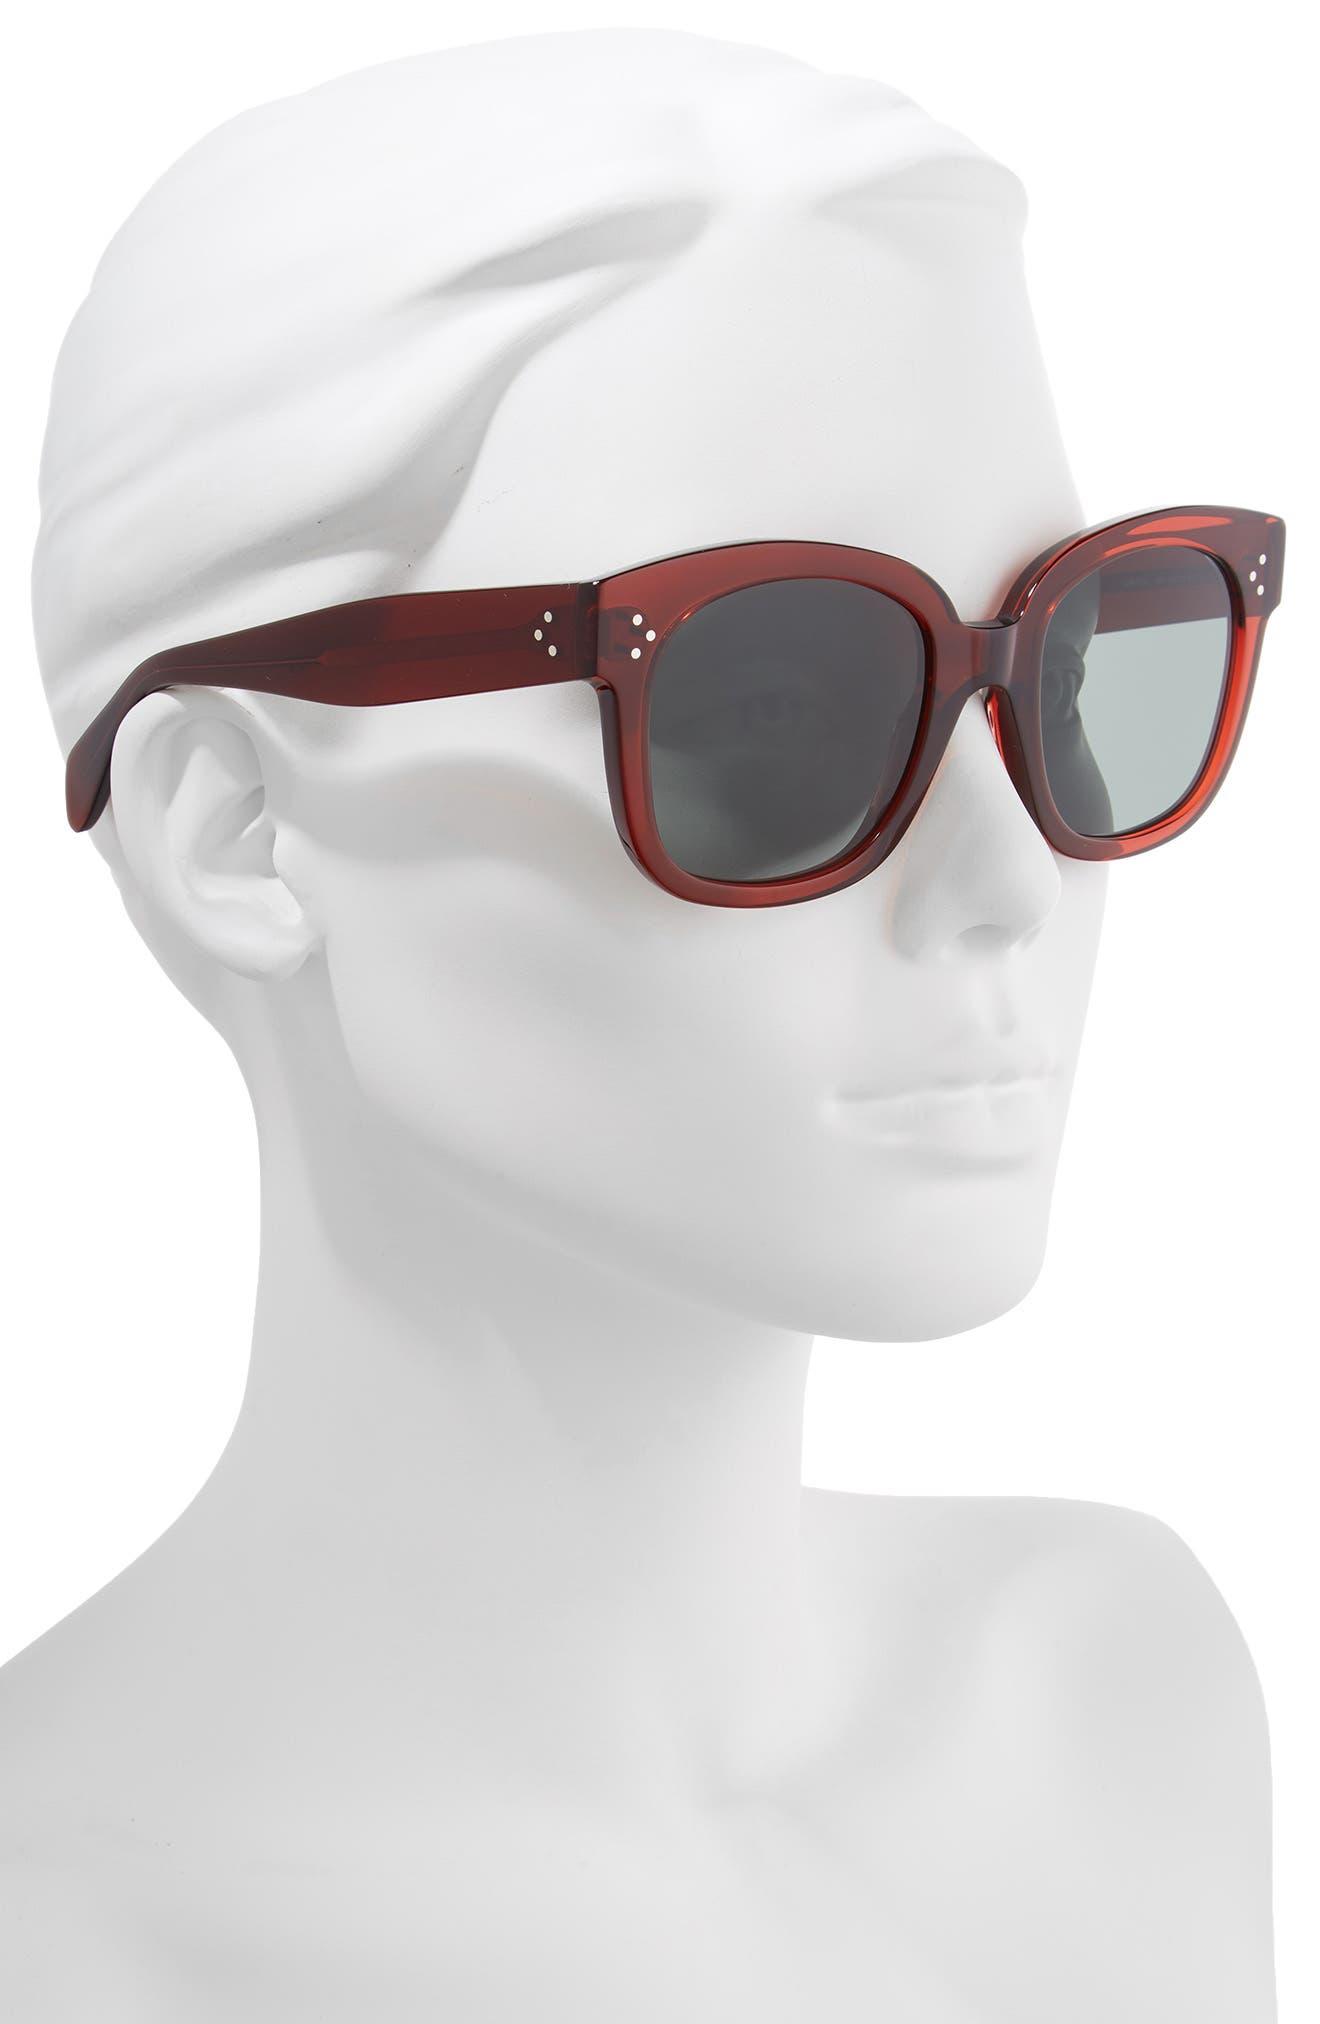 54mm Round Sunglasses,                             Alternate thumbnail 2, color,                             BORDEAUX/ GREEN